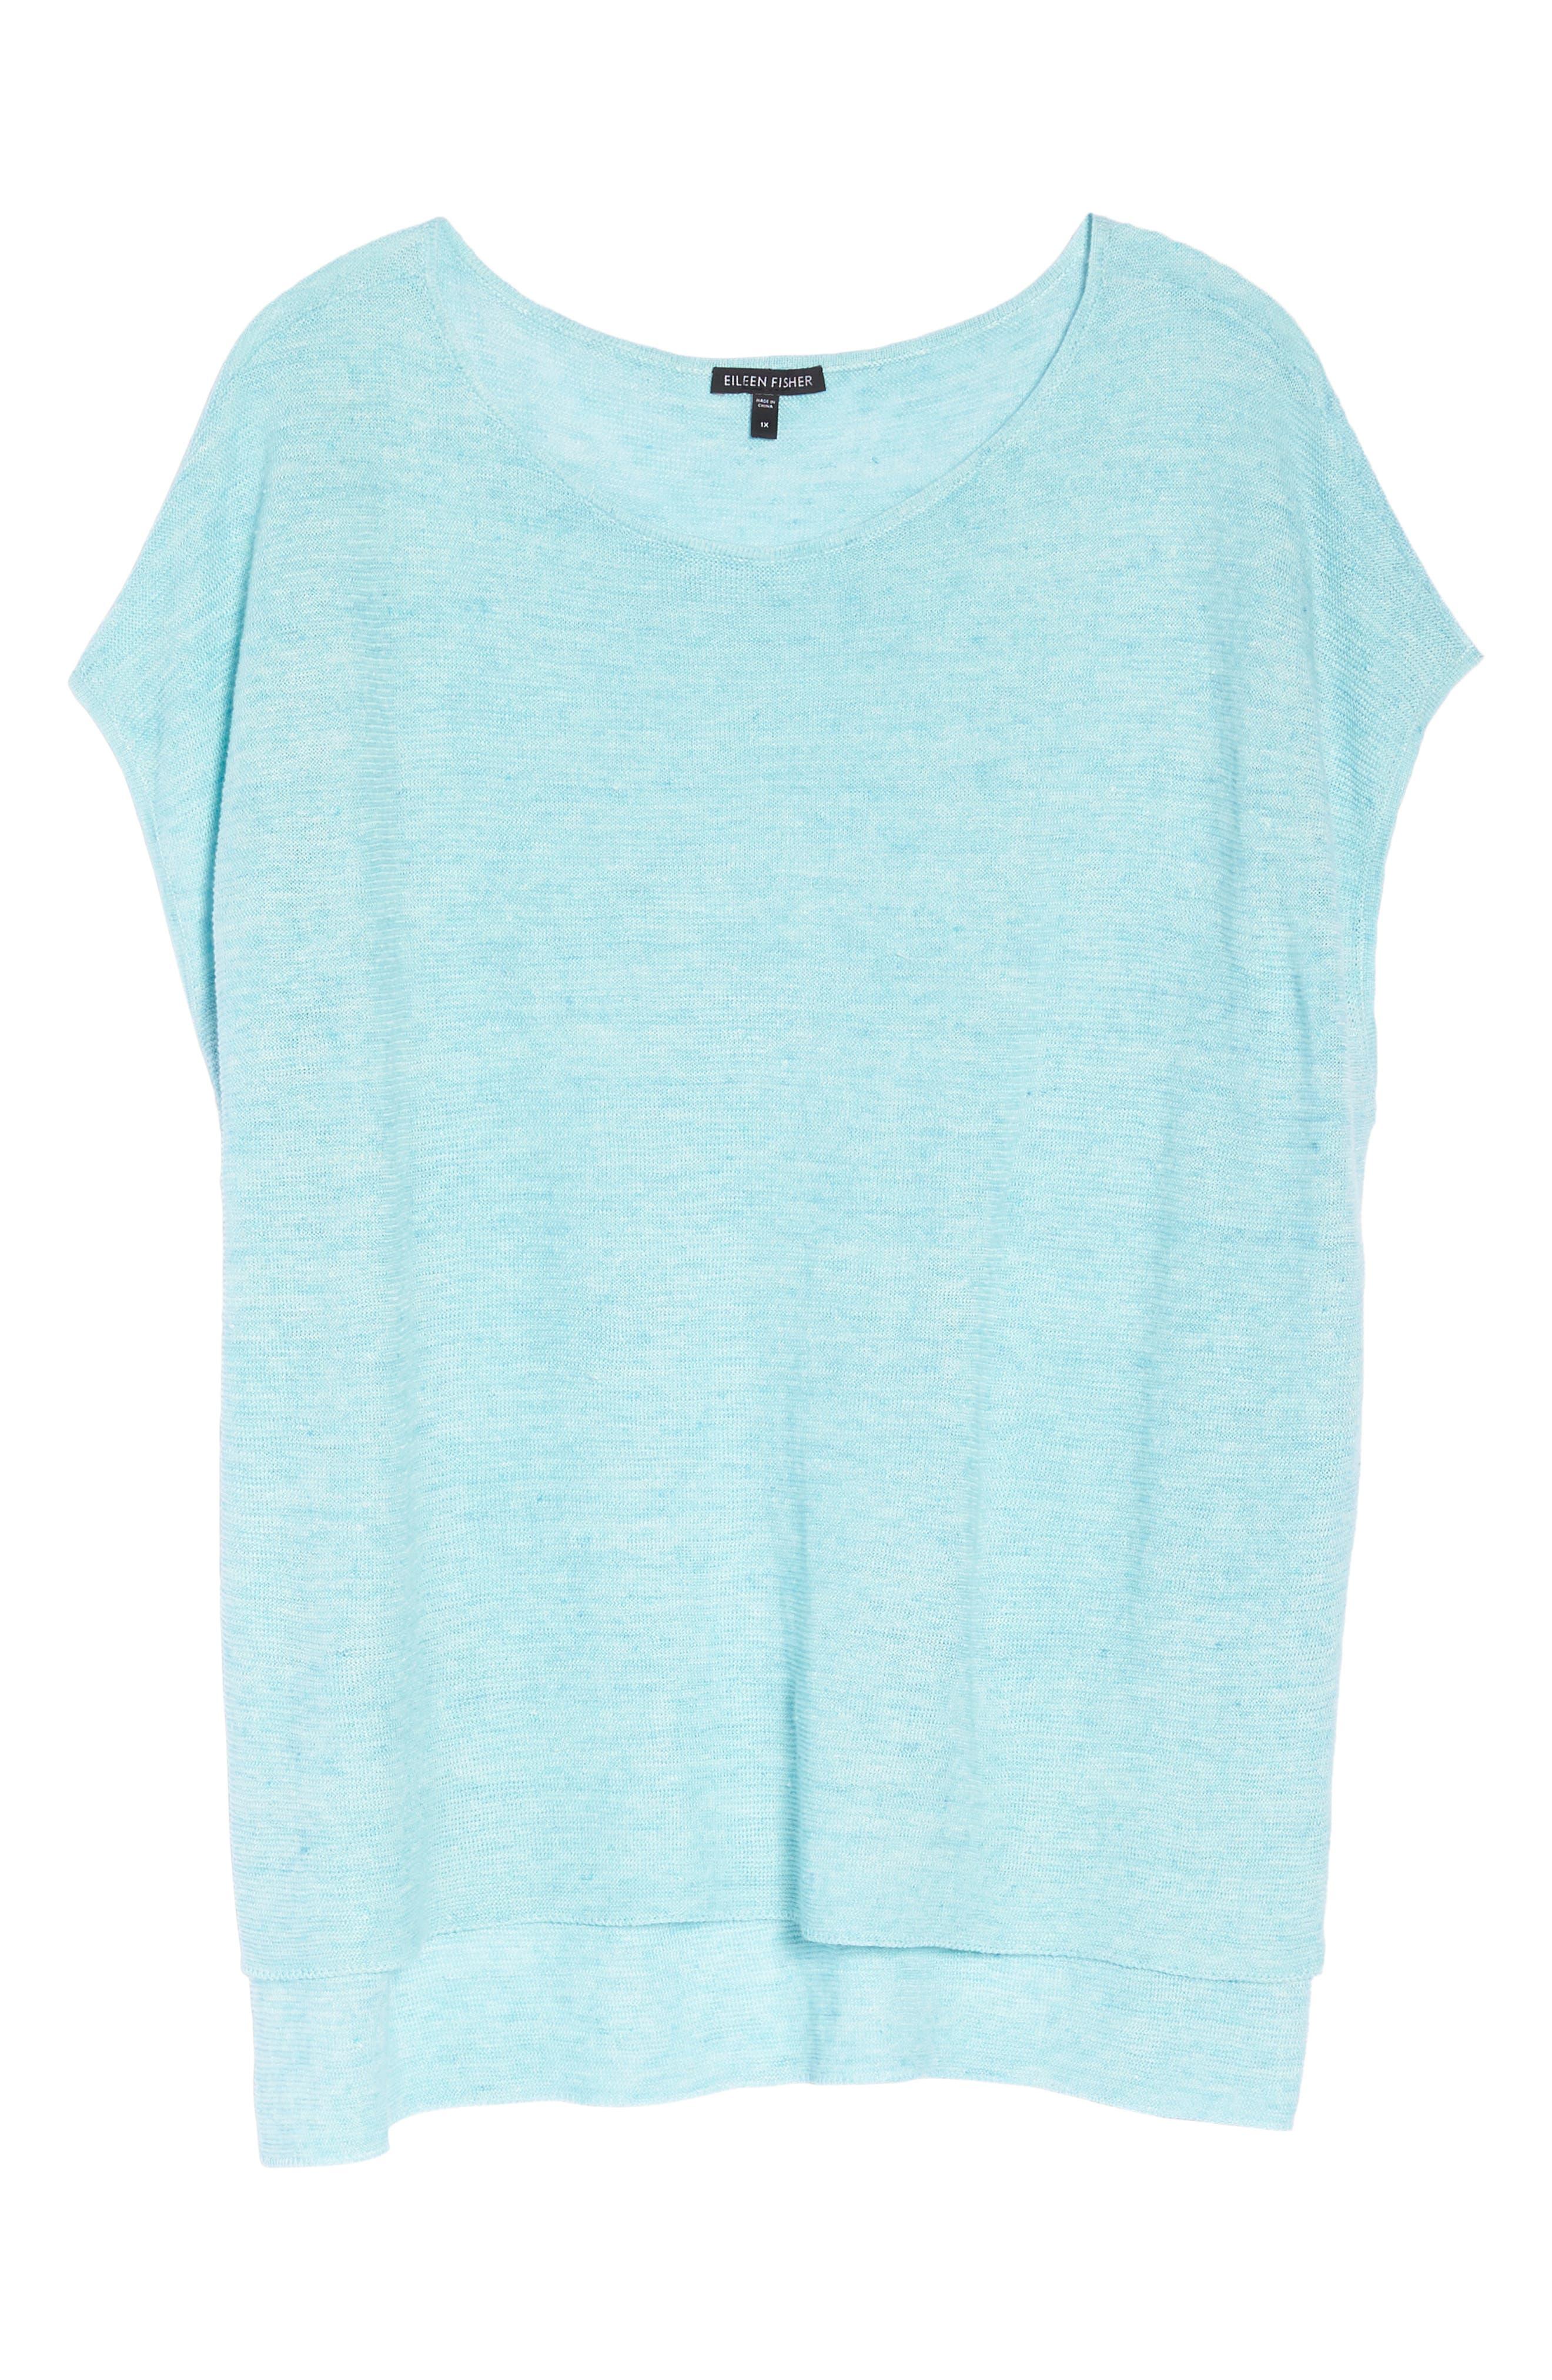 Organic Linen Poncho,                             Alternate thumbnail 6, color,                             Pale Turquoise